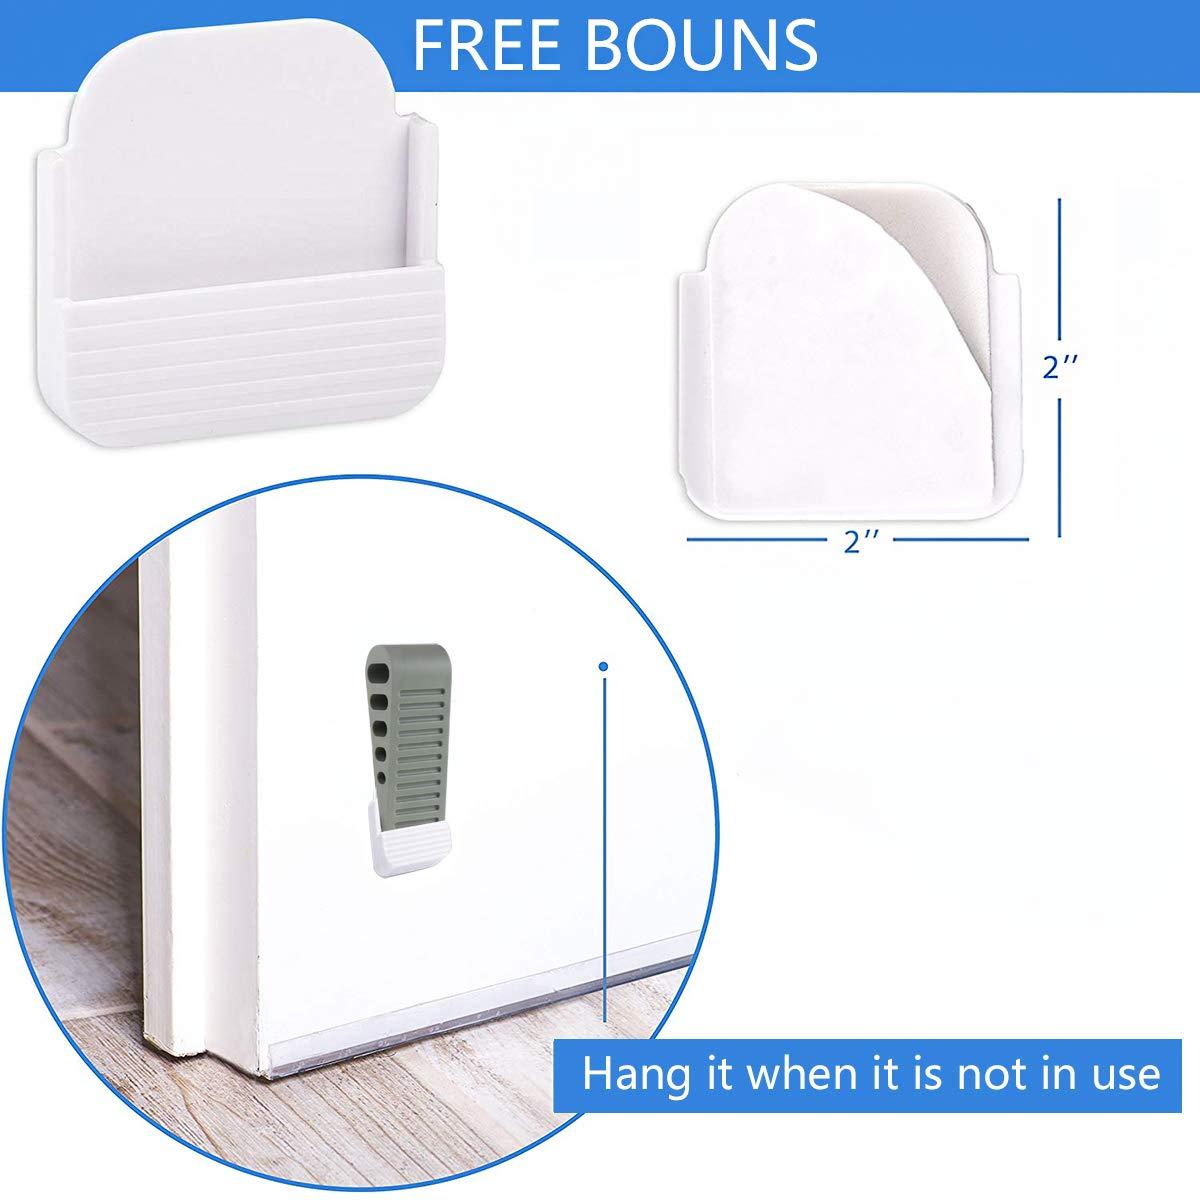 Prevents Pinching of Small Child Fingerss Premium Rubber Door Stops Decorative Door Stoppers Black-4 Non-Toxic No unpleasant Door Stopper Works on All Floor Surfaces